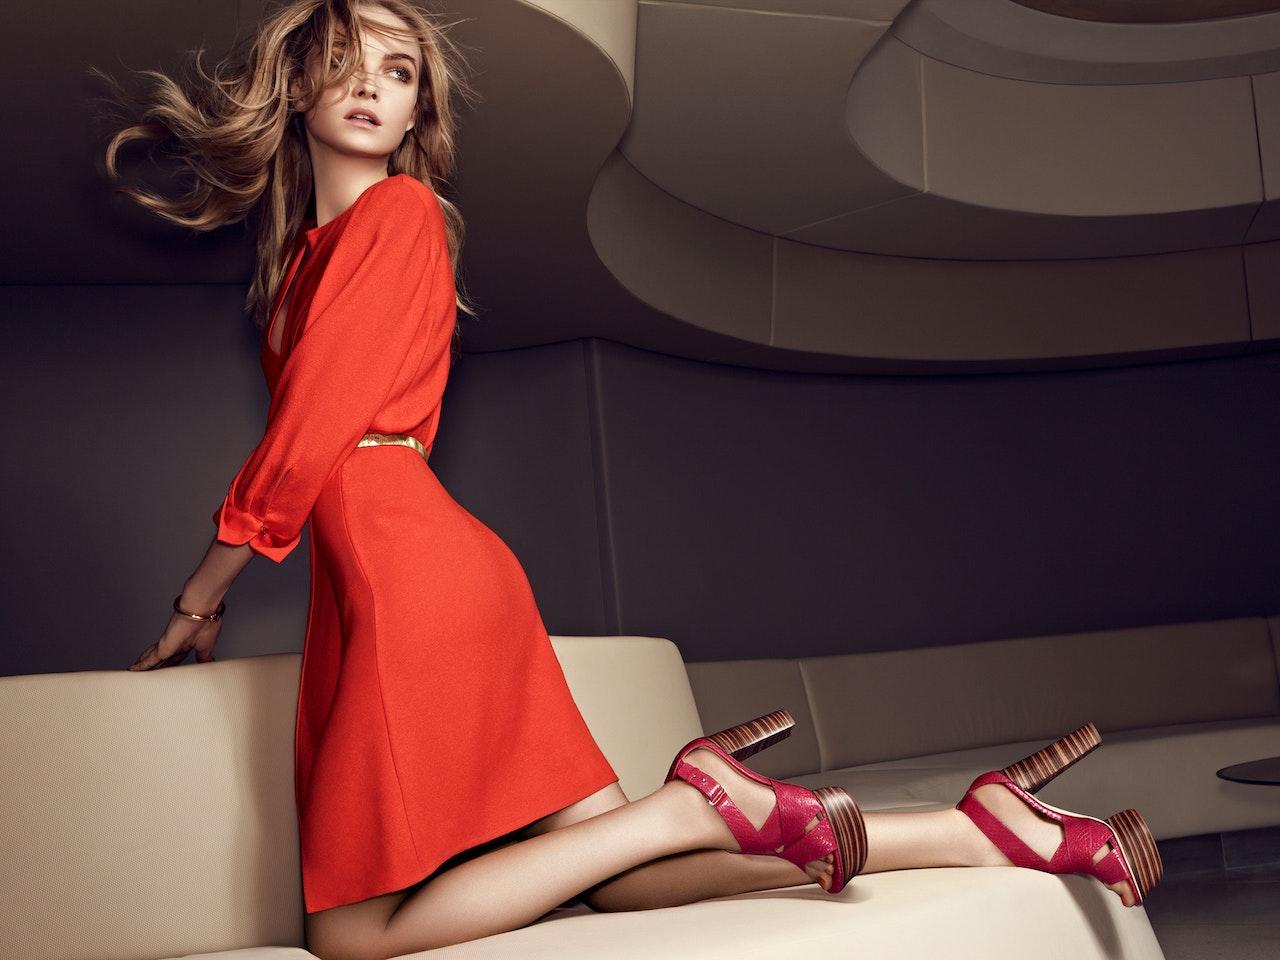 Fashion - VIA SPIGA  /  Photographer: Thomas Nützl  /  Agency: US Vogue